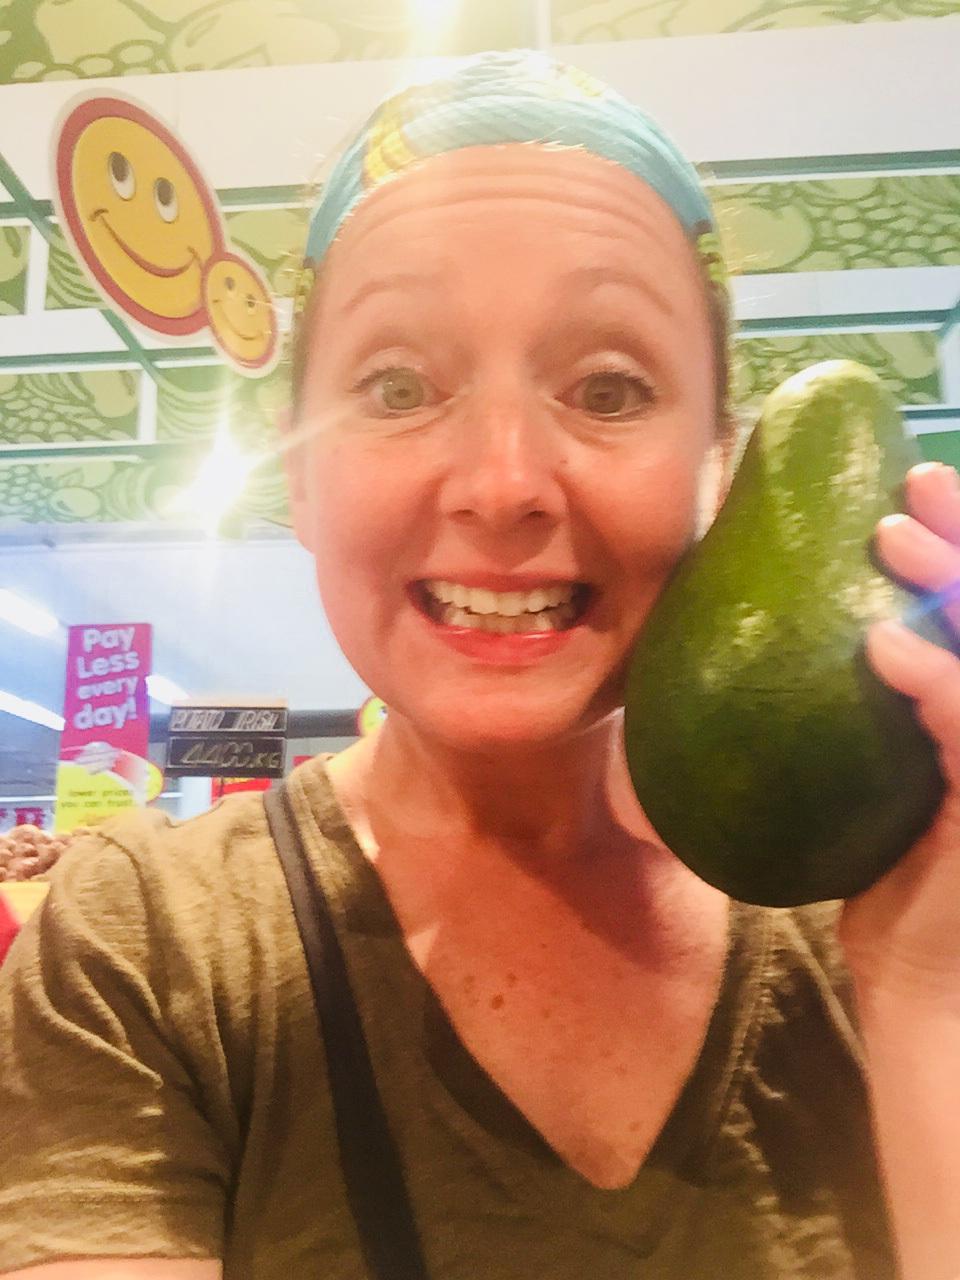 Me holding a giant avocado